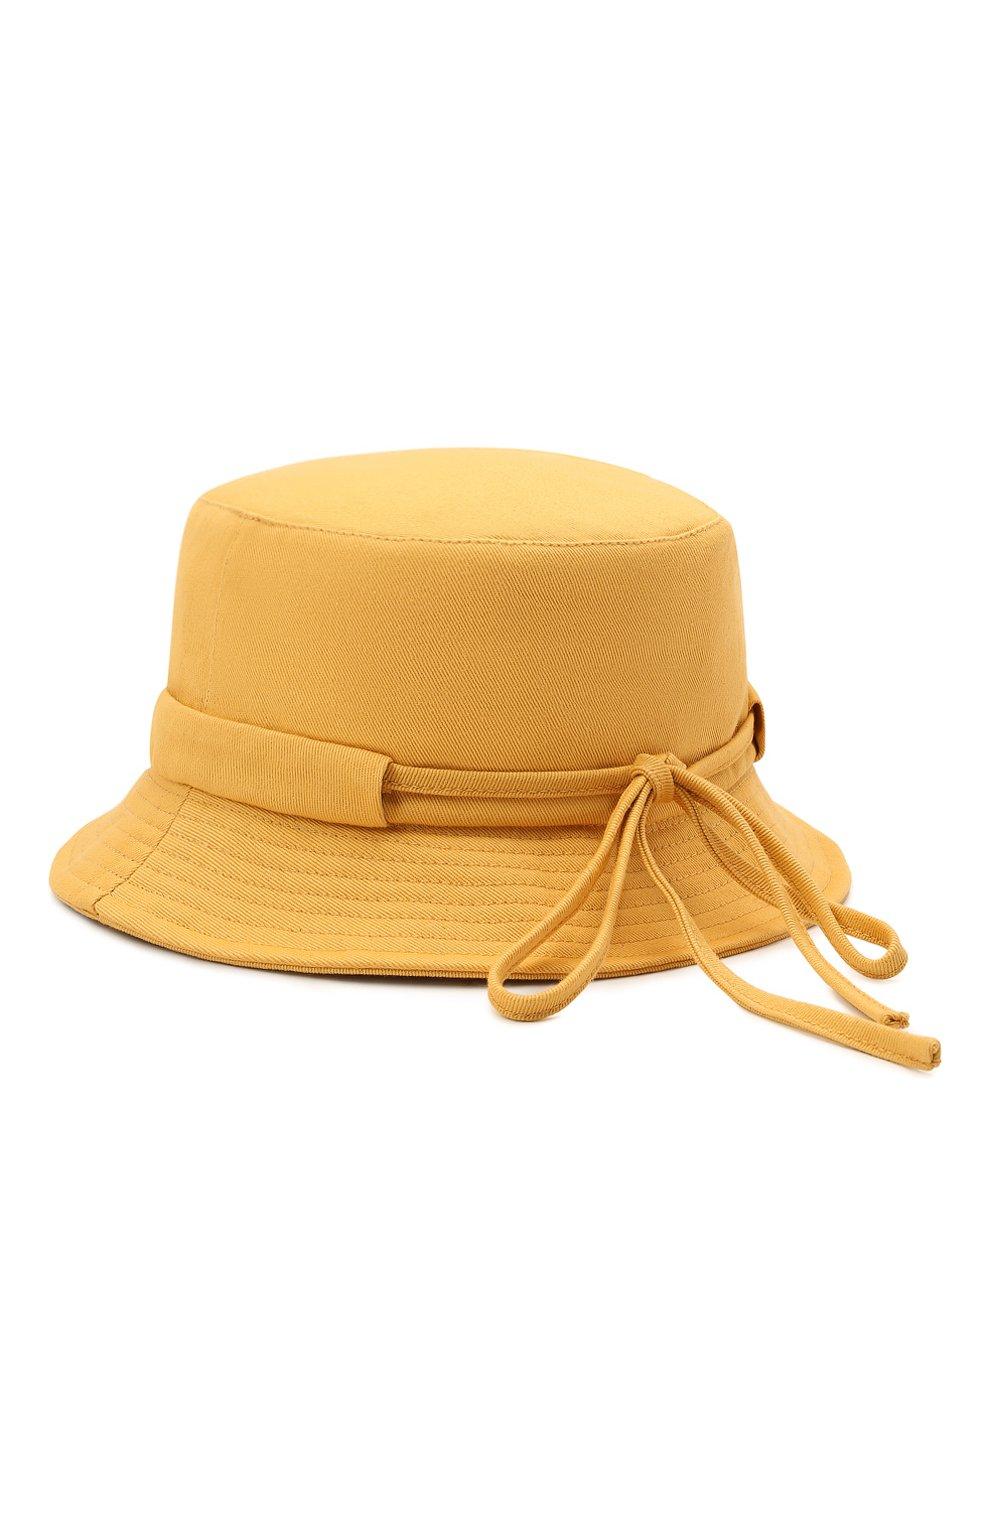 Мужская хлопковая панама le bob gadjo JACQUEMUS желтого цвета, арт. 215AC03/506220 | Фото 2